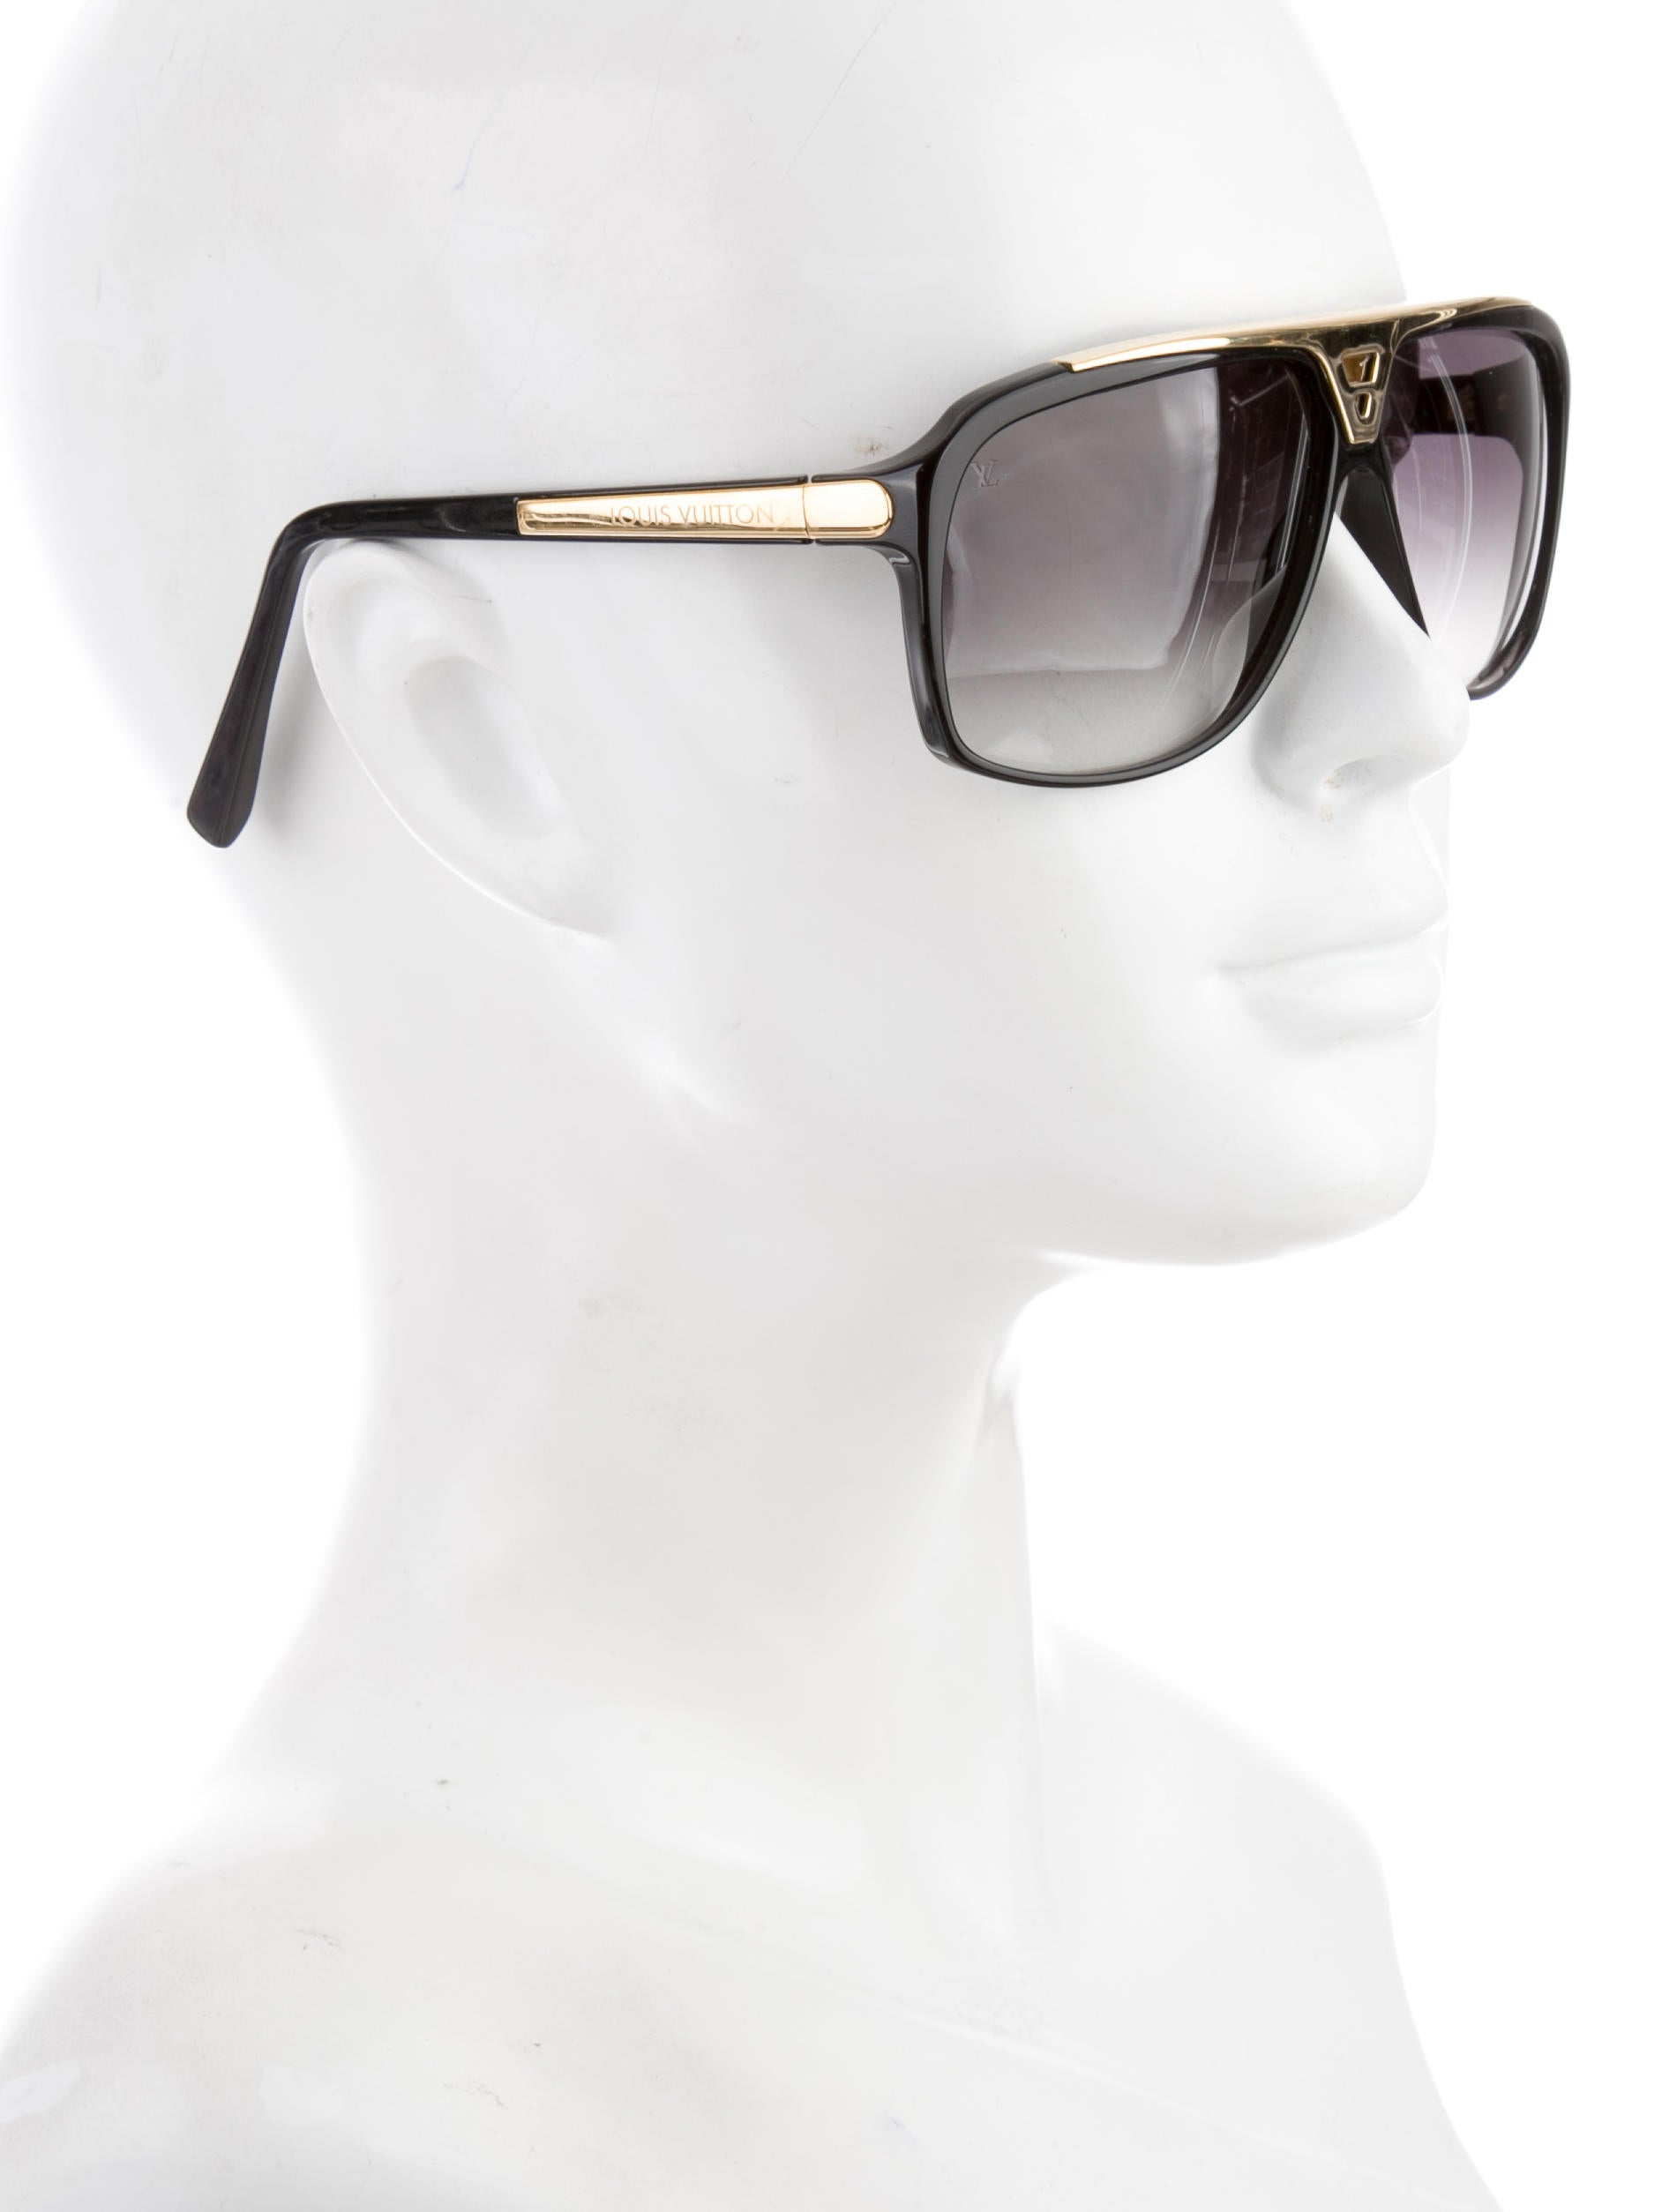 053747dca261b Louis Vuitton Vintage Aviator Sunglasses